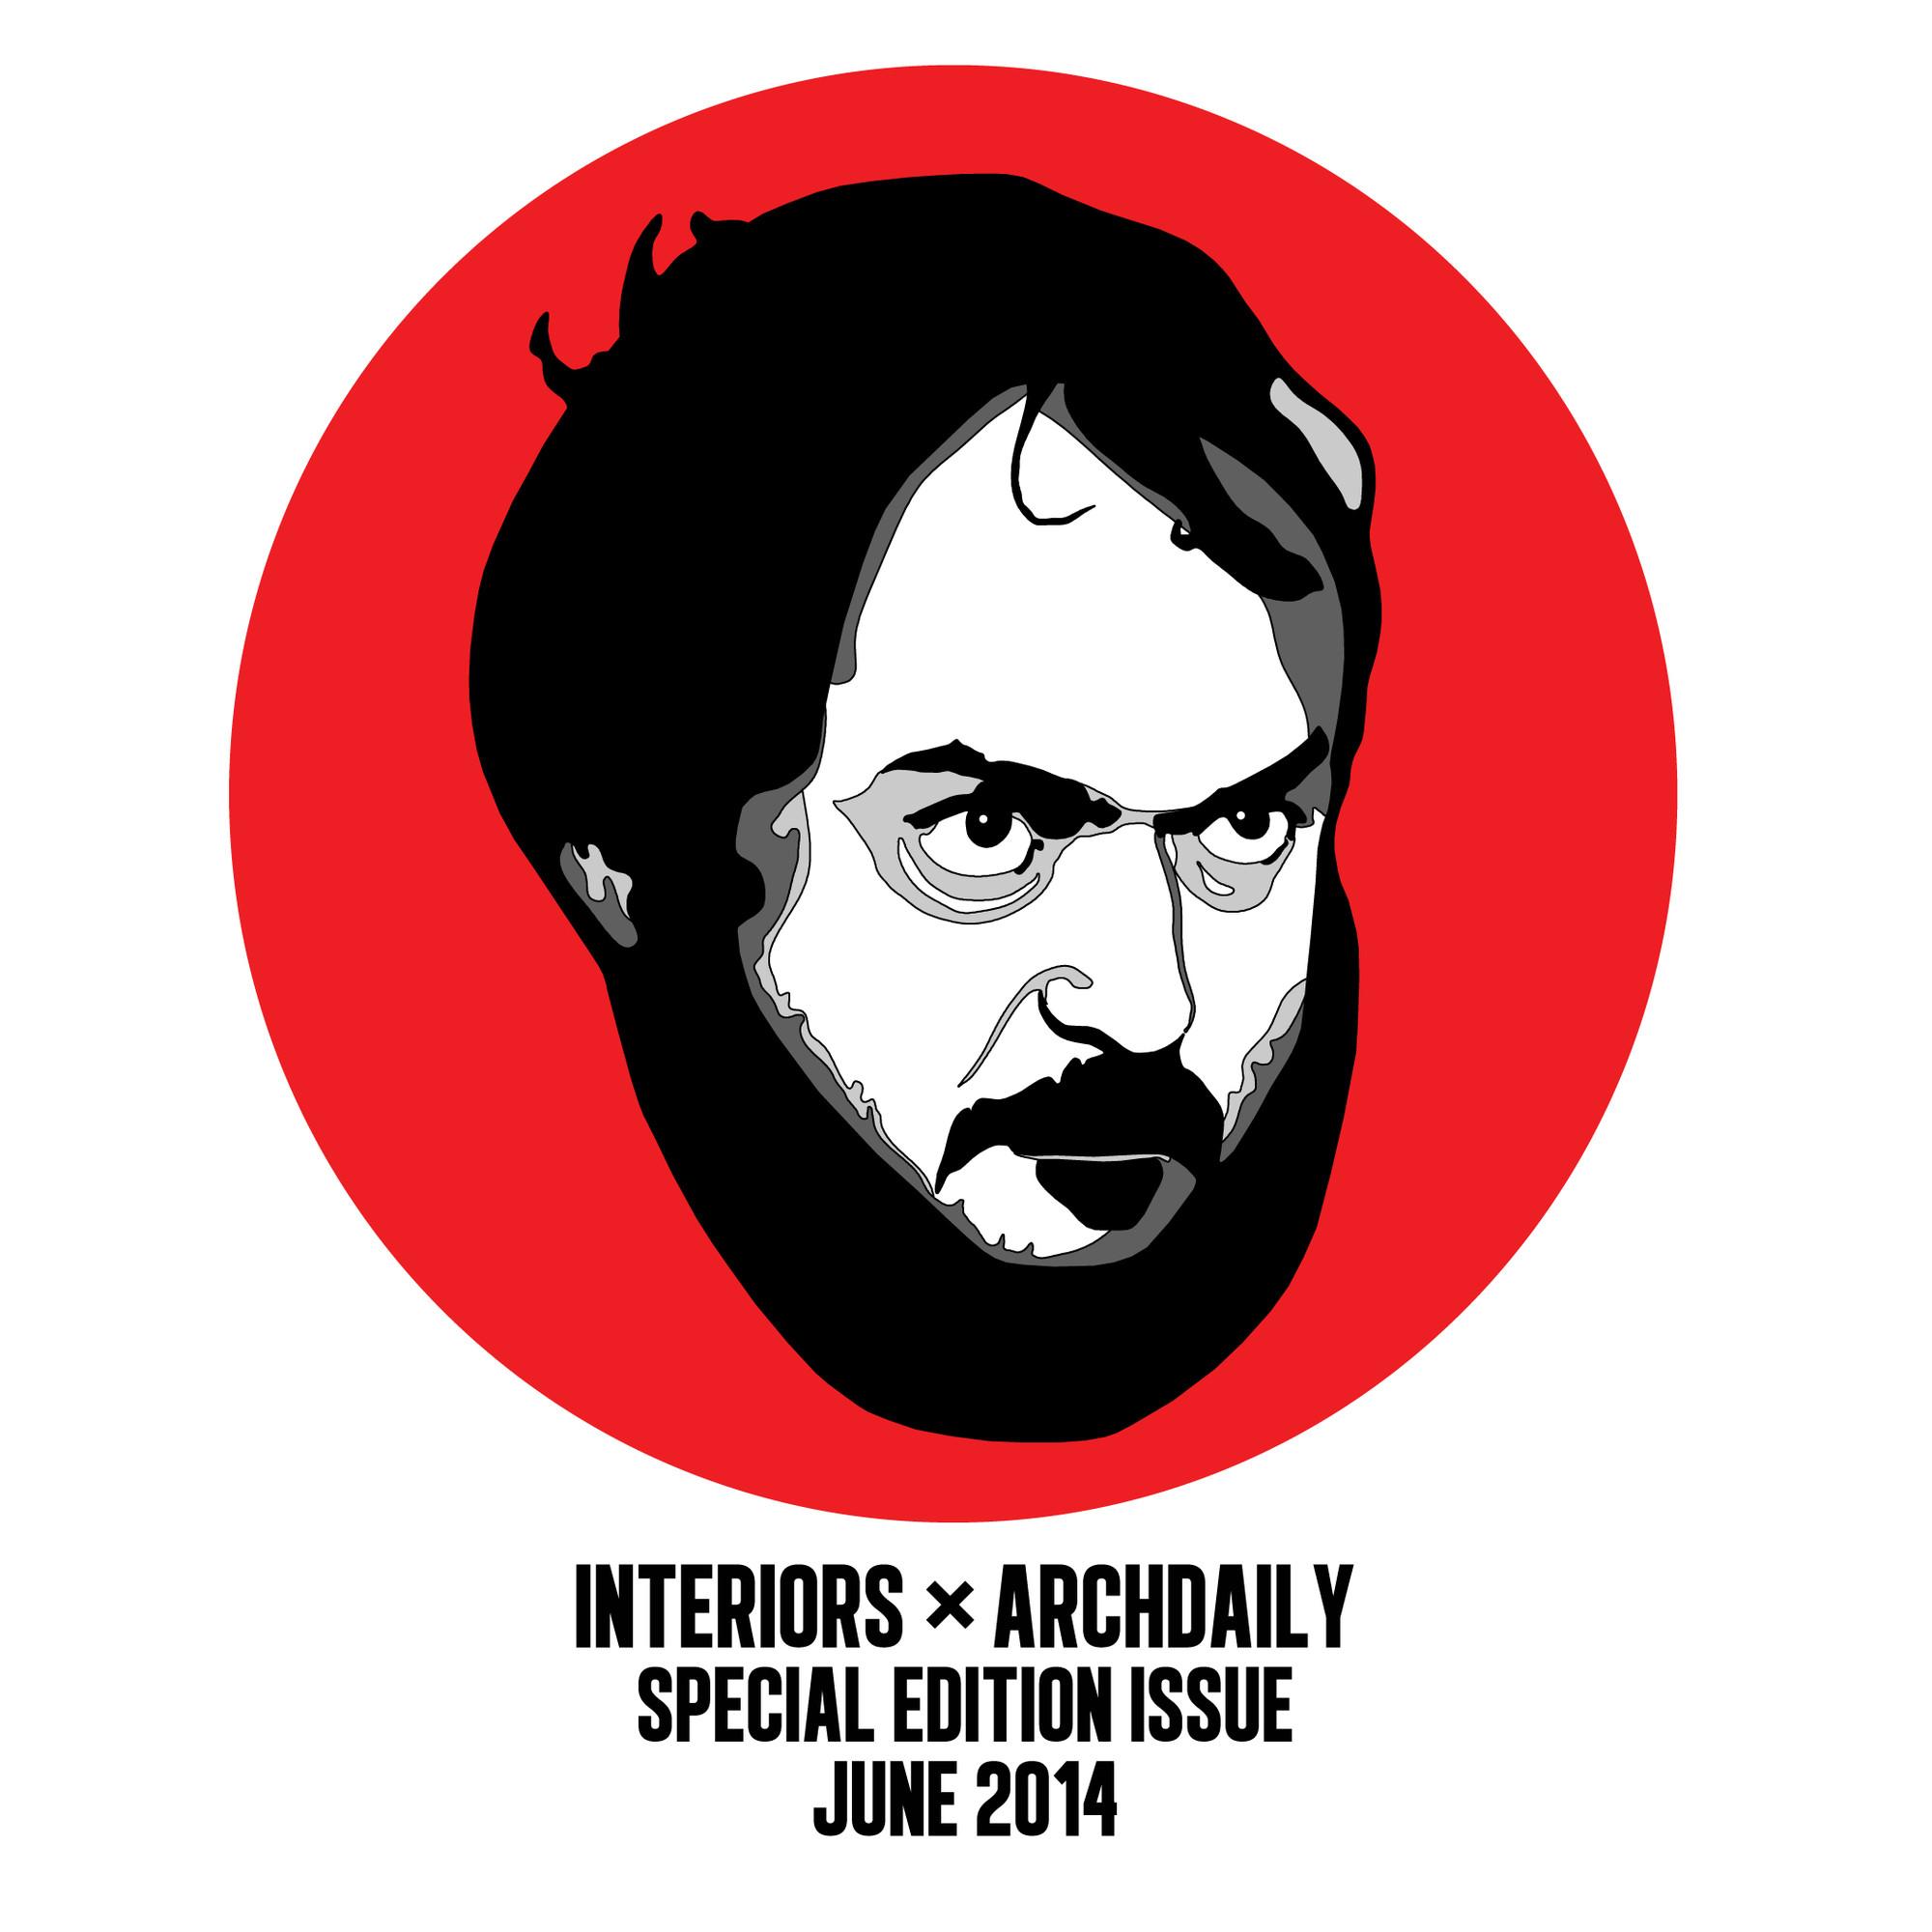 INTERIORS: Stanley Kubrick, Courtesy of Mehruss Jon AhiandArmen Karaoghlanian